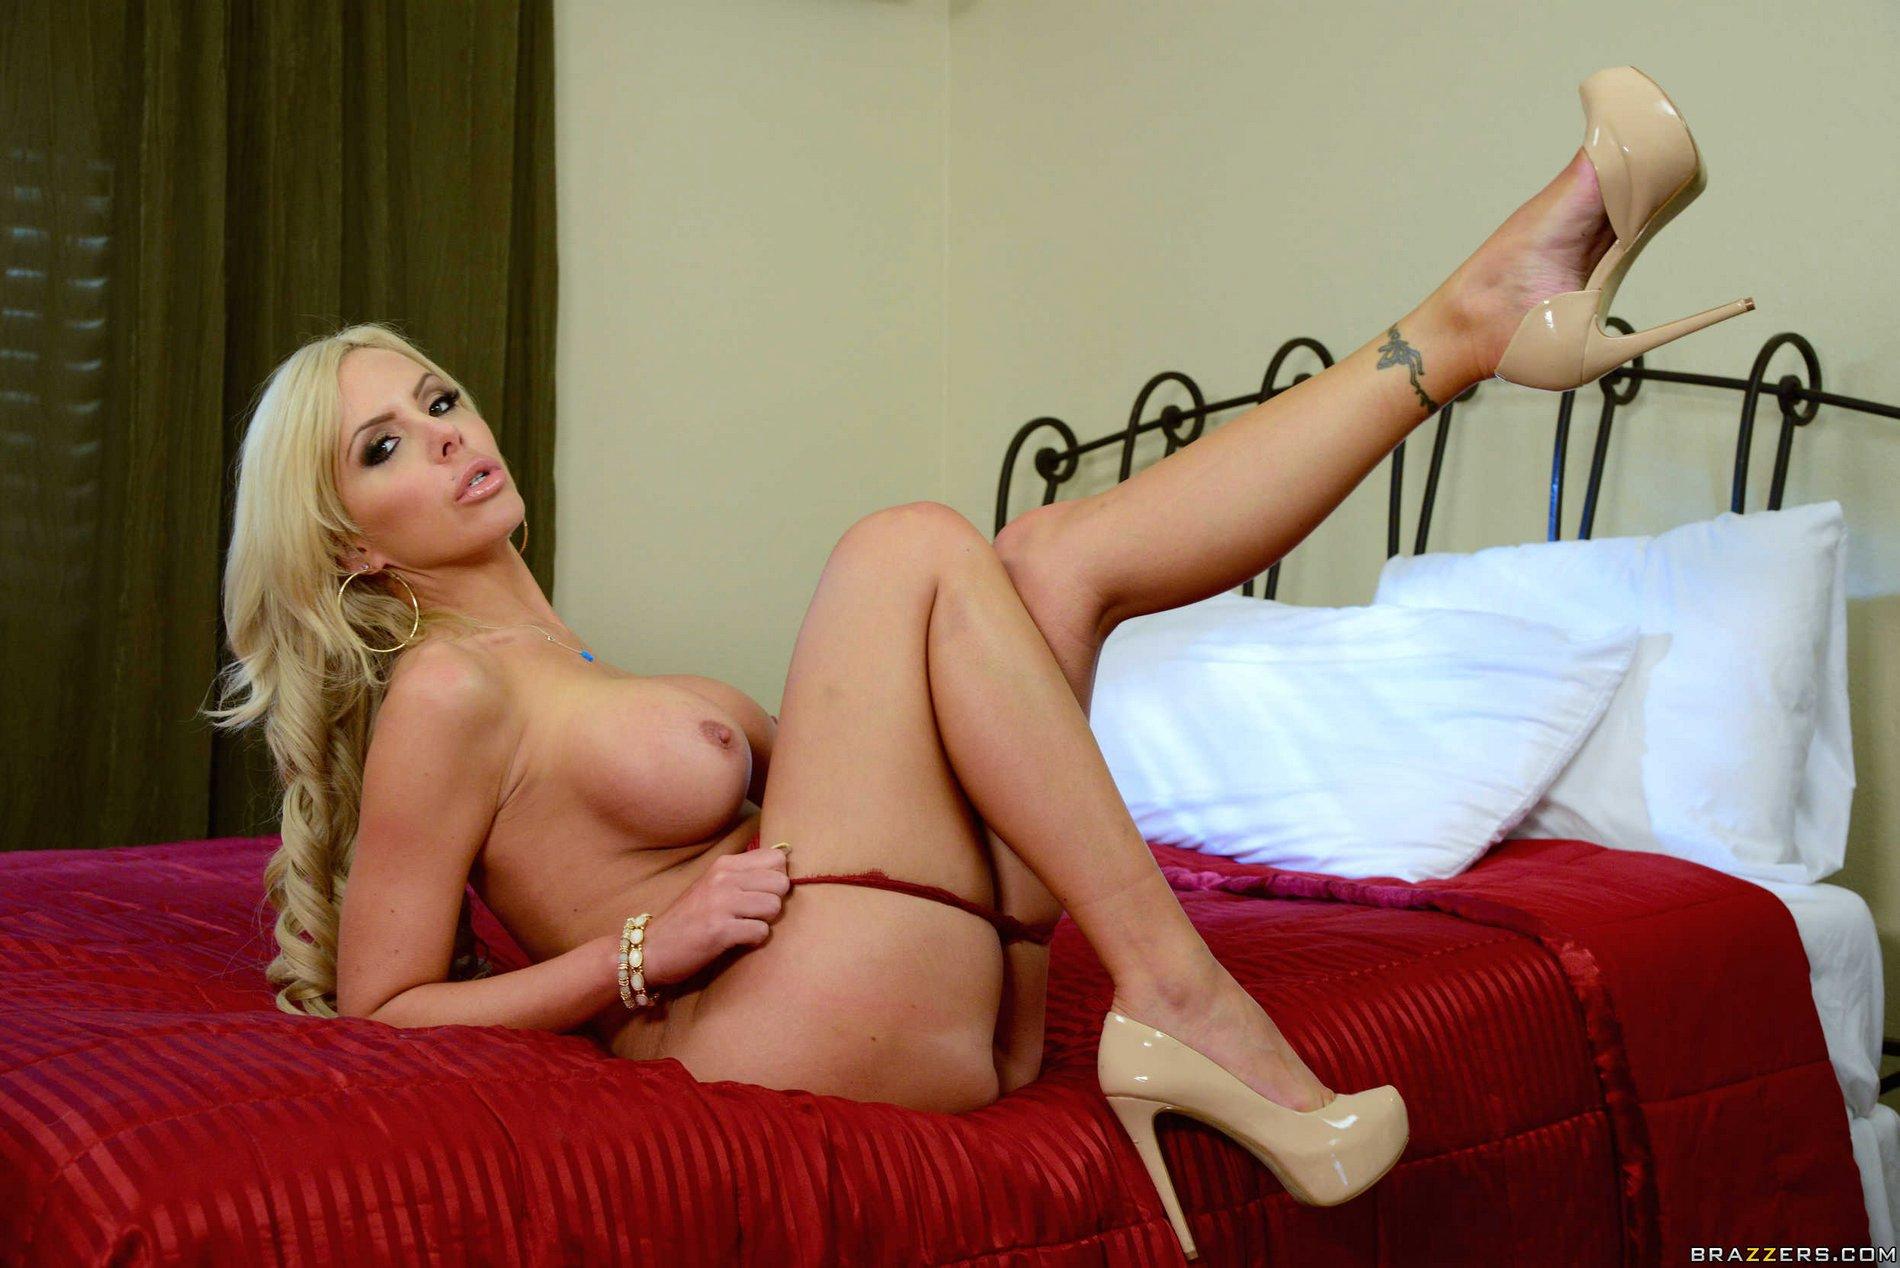 Free black high heels sex pics